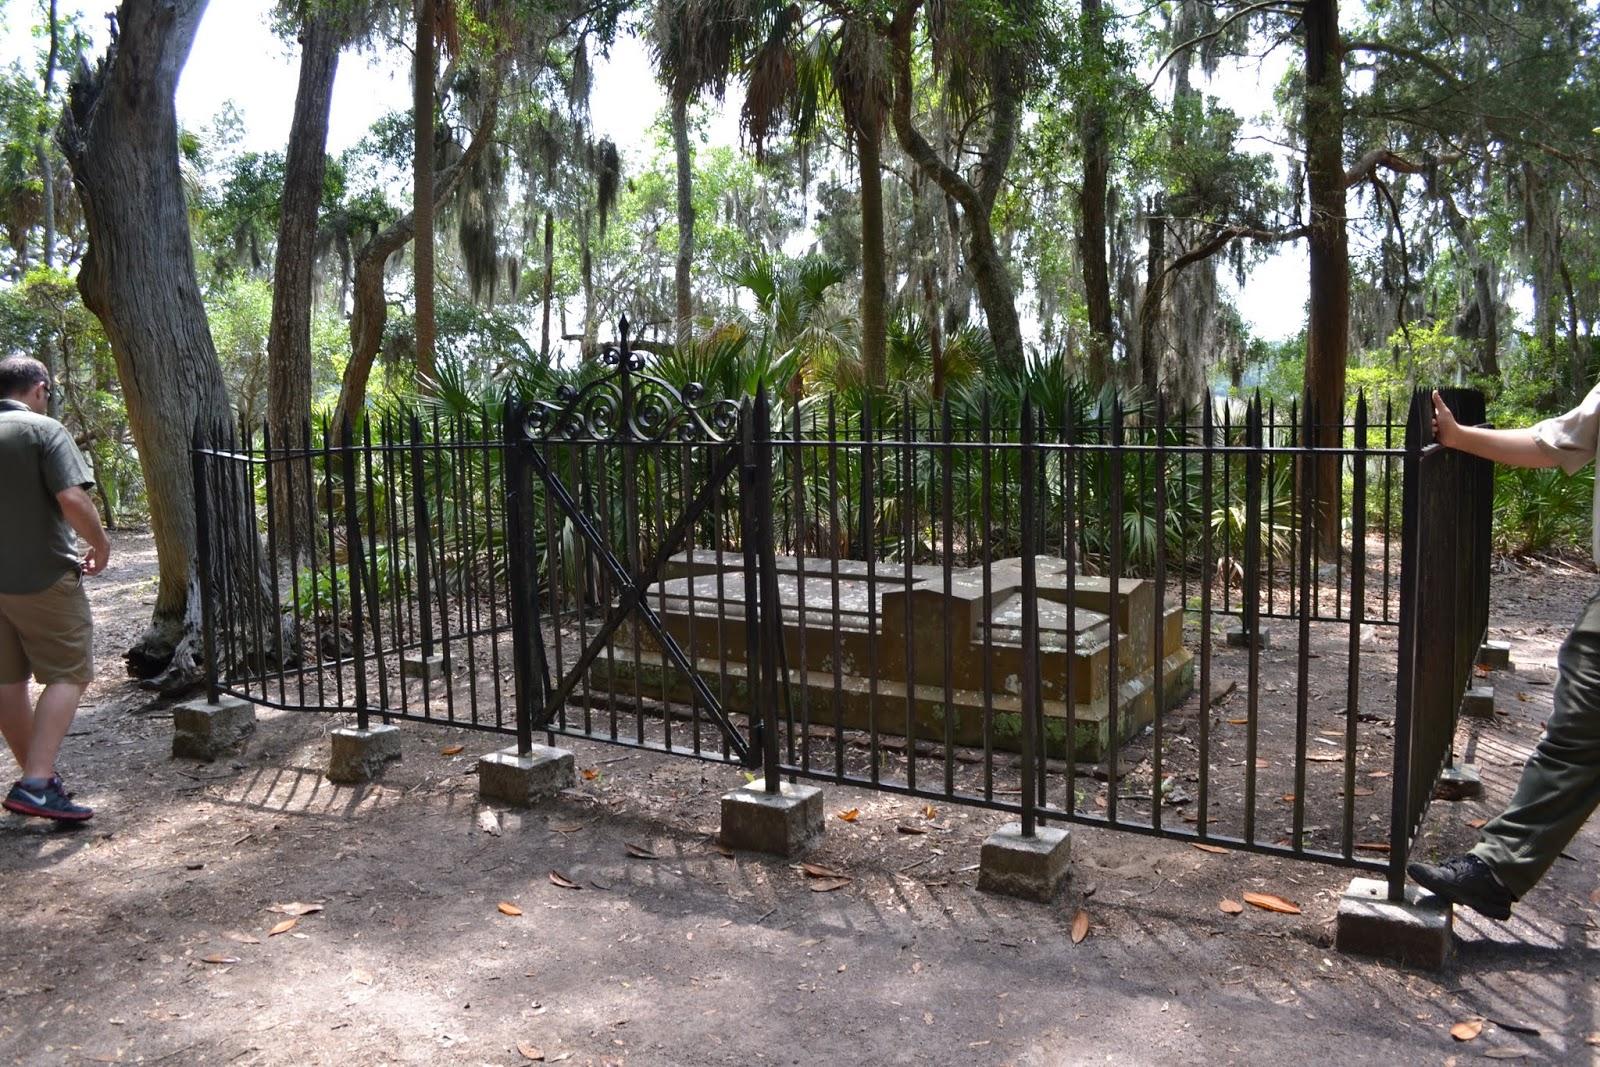 Плантация Вормсло, Cаванна, Джорджия (Wormsloe Historic Site, Savannah, GA)